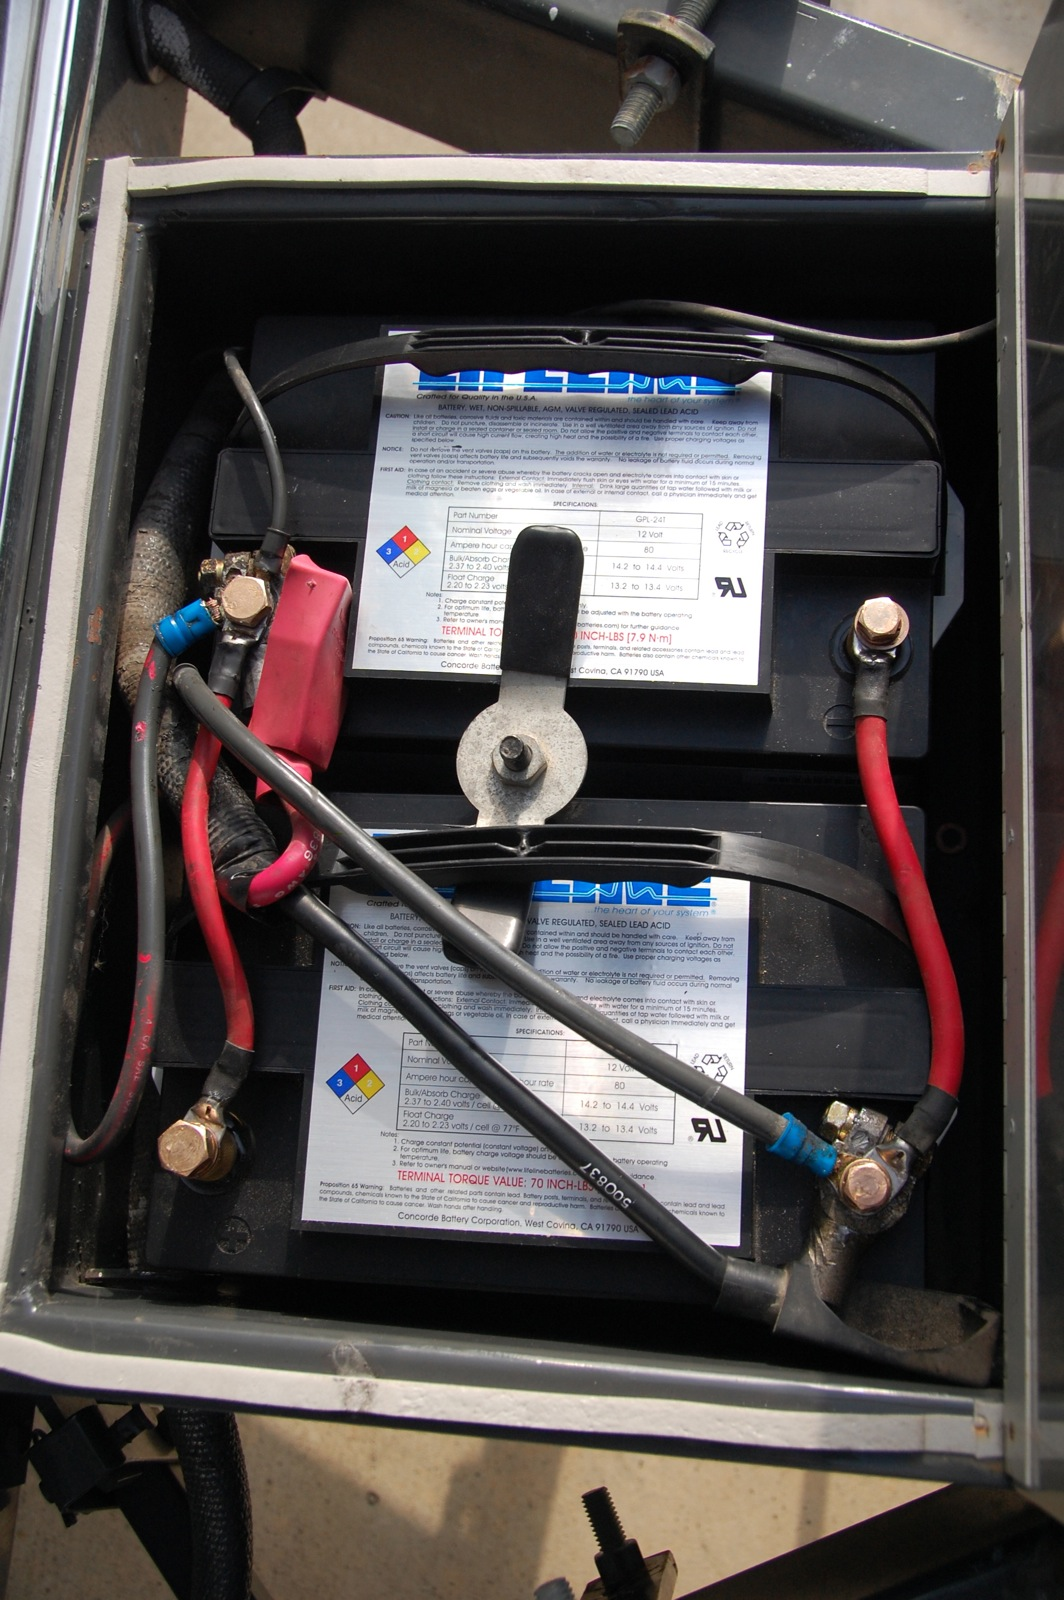 Click image for larger version  Name:DSC_0093 Lifeline AGM batteries.jpg Views:95 Size:430.4 KB ID:233349